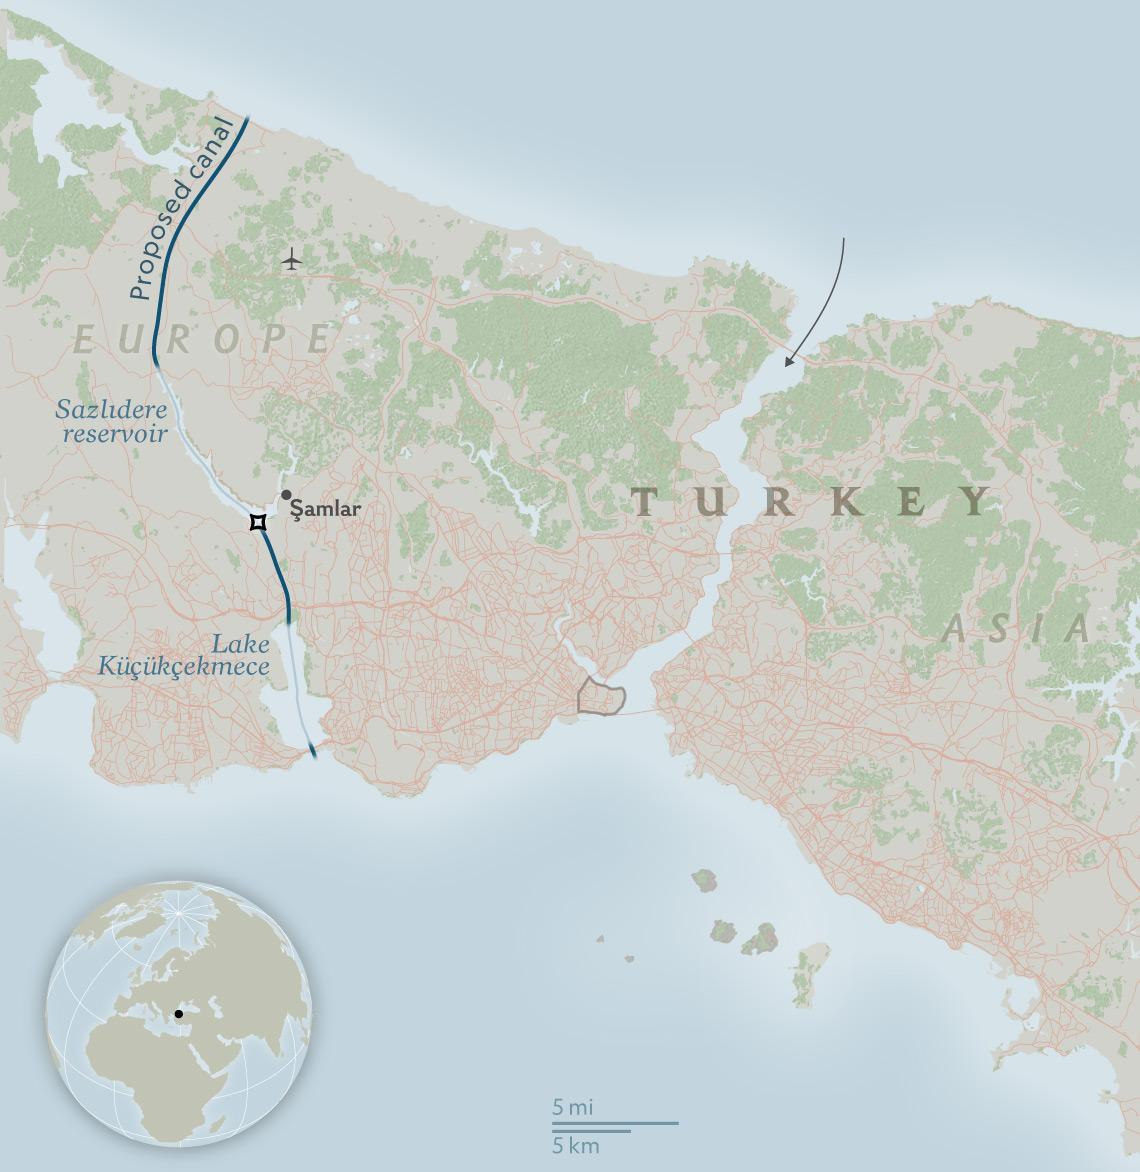 Canal (Kanal) Istanbul May Displace Thousands, Impact Ocean